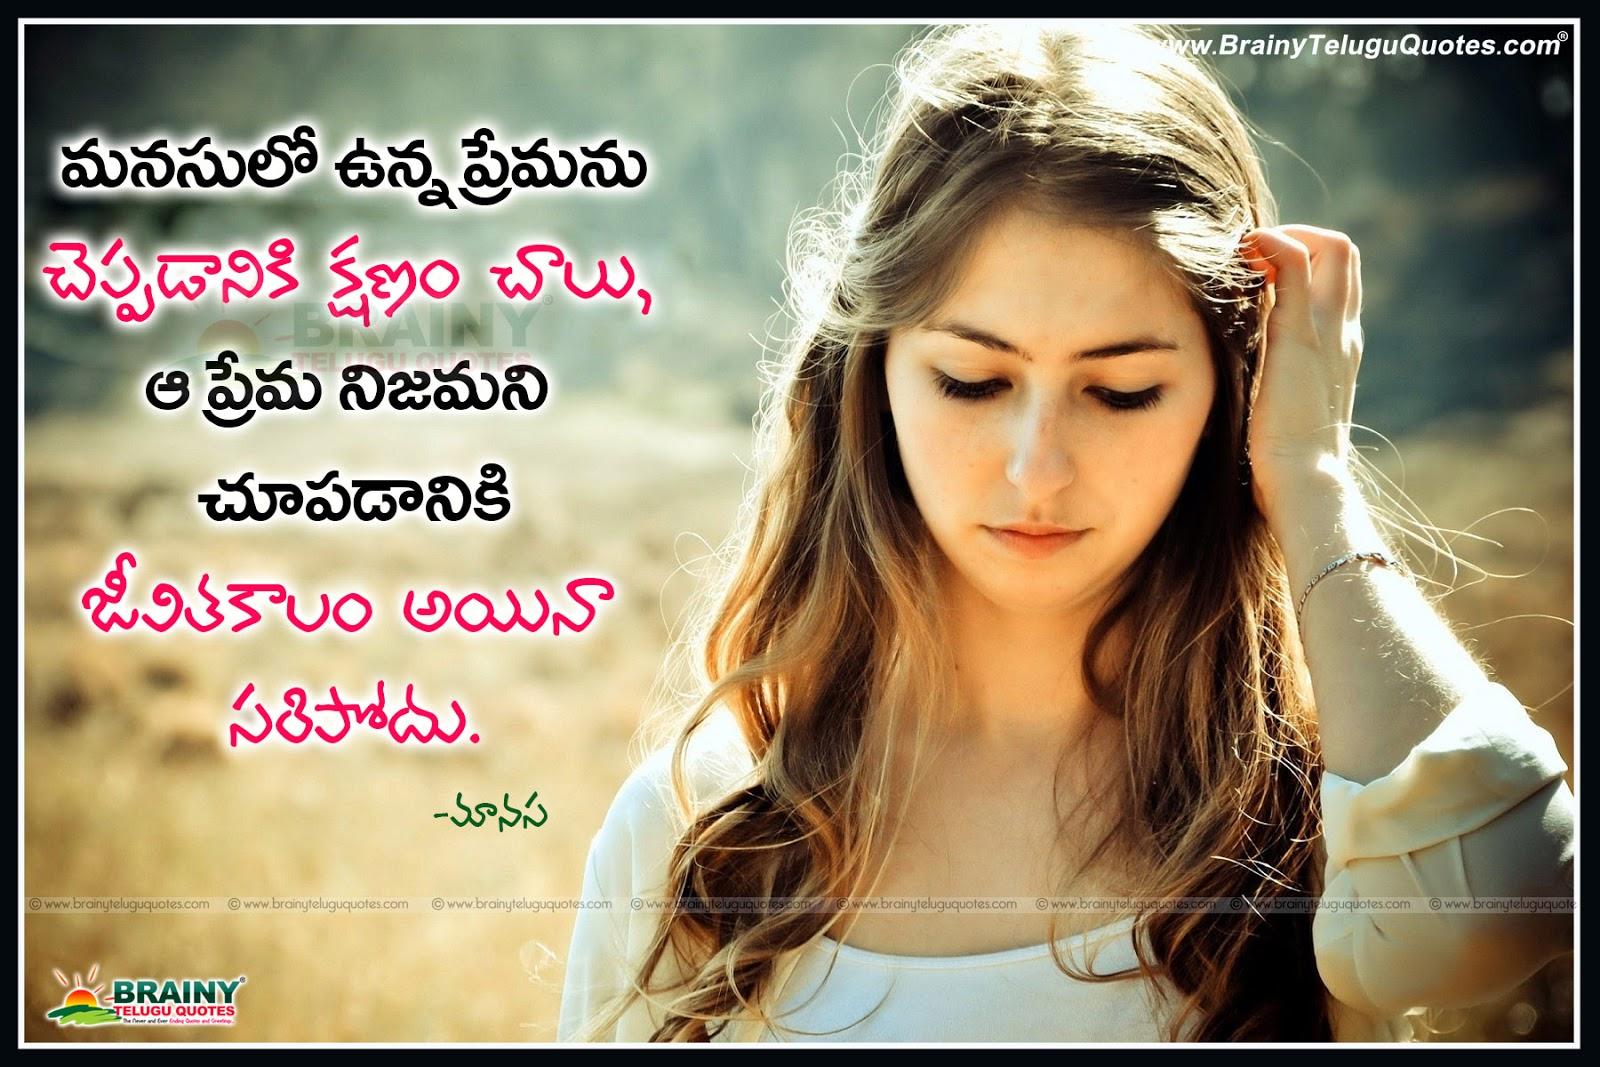 Friendship Quotes For Girls And Boys Telugu Best Loving Telugu Love